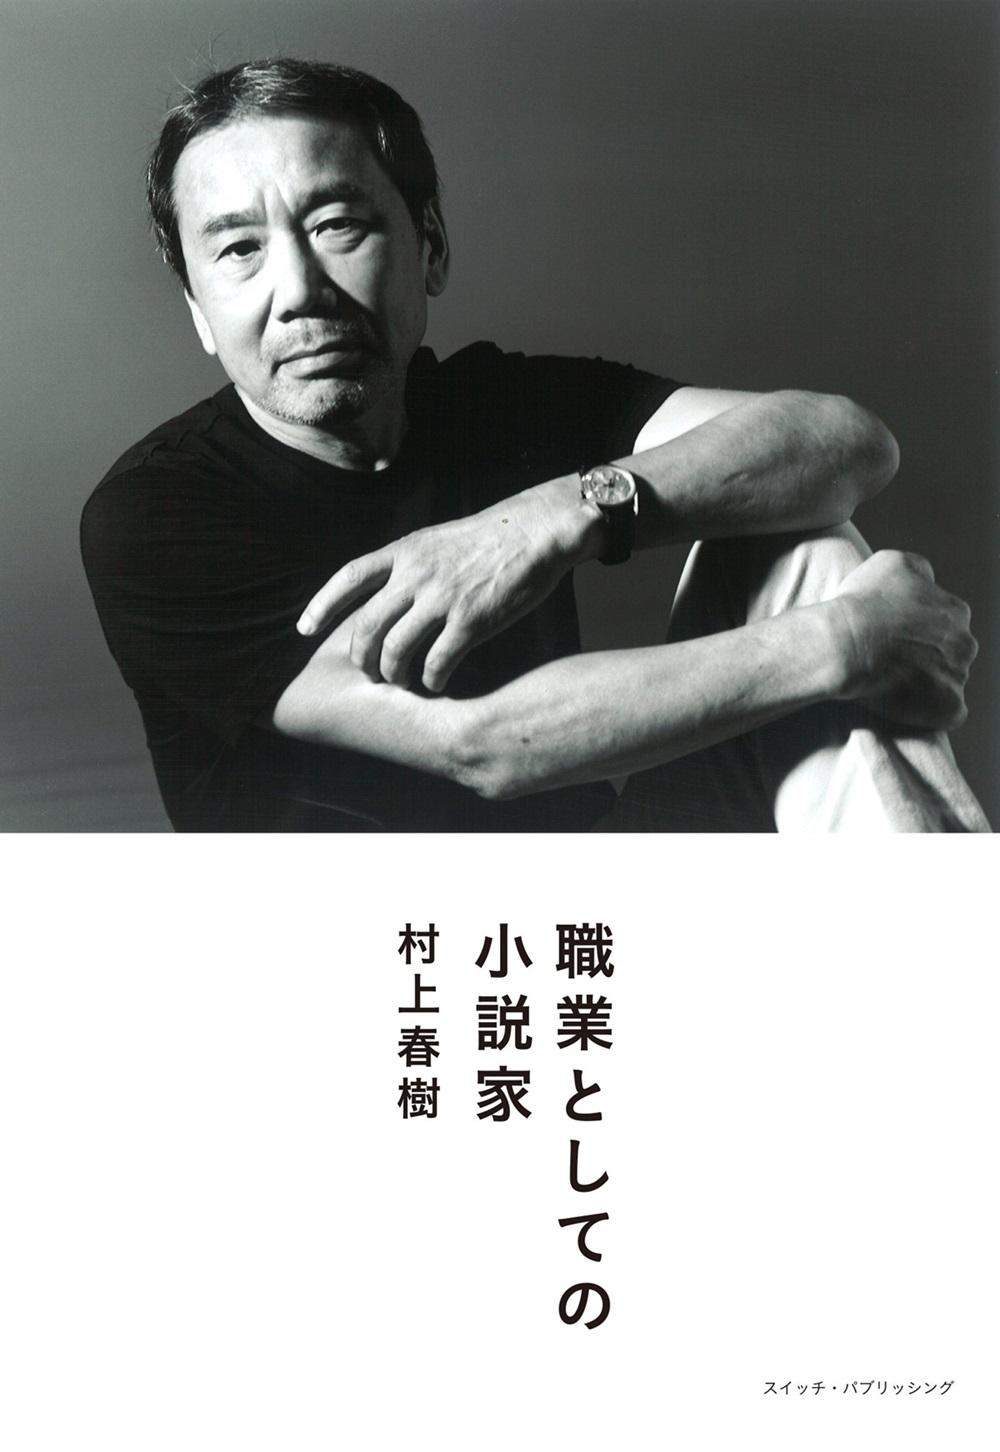 haruki_murakami 職業としての小説家 村上春樹